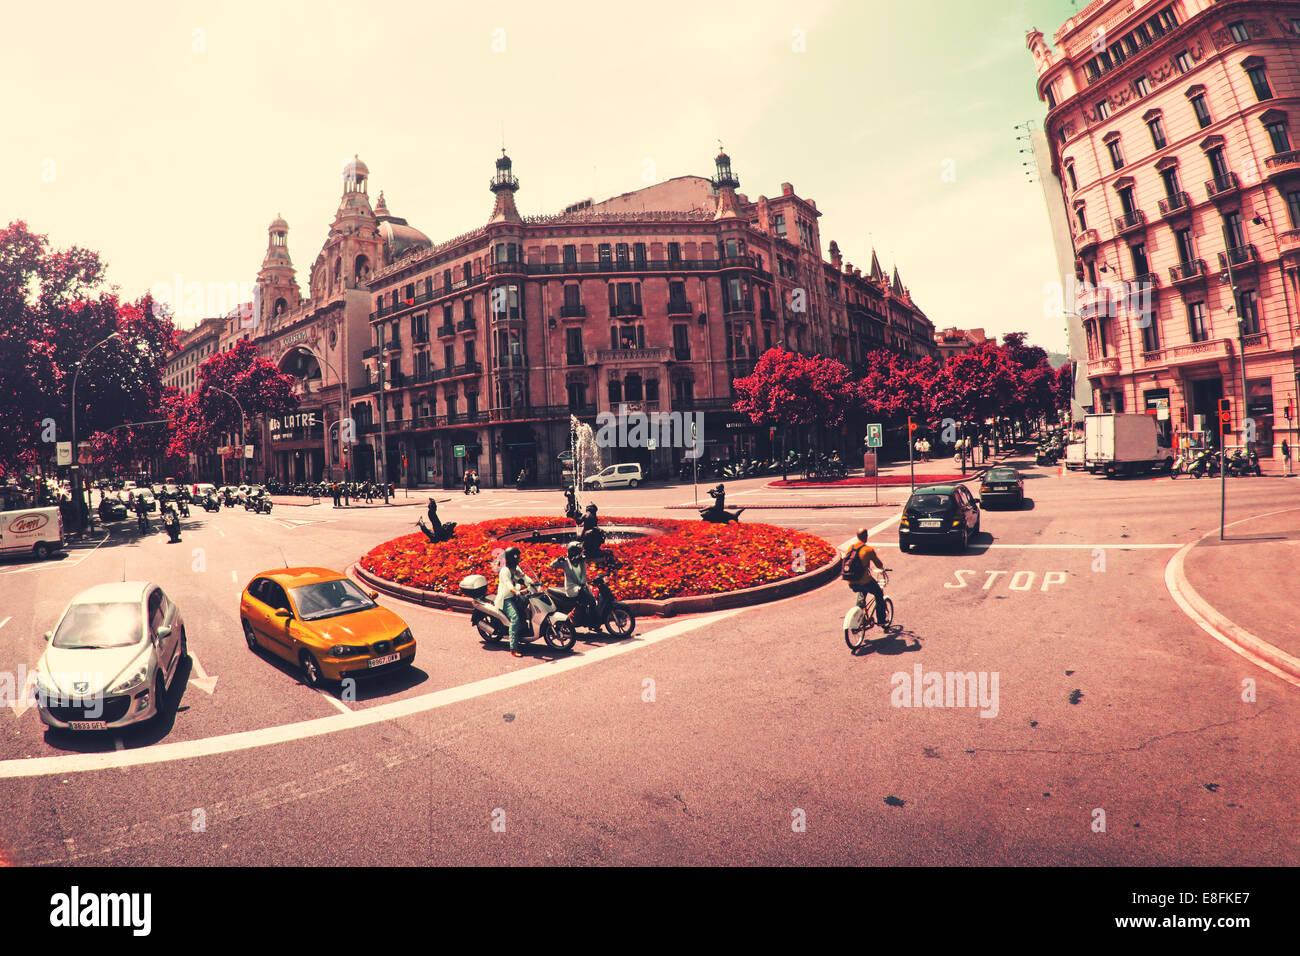 España, Barcelona, Street Scene Imagen De Stock